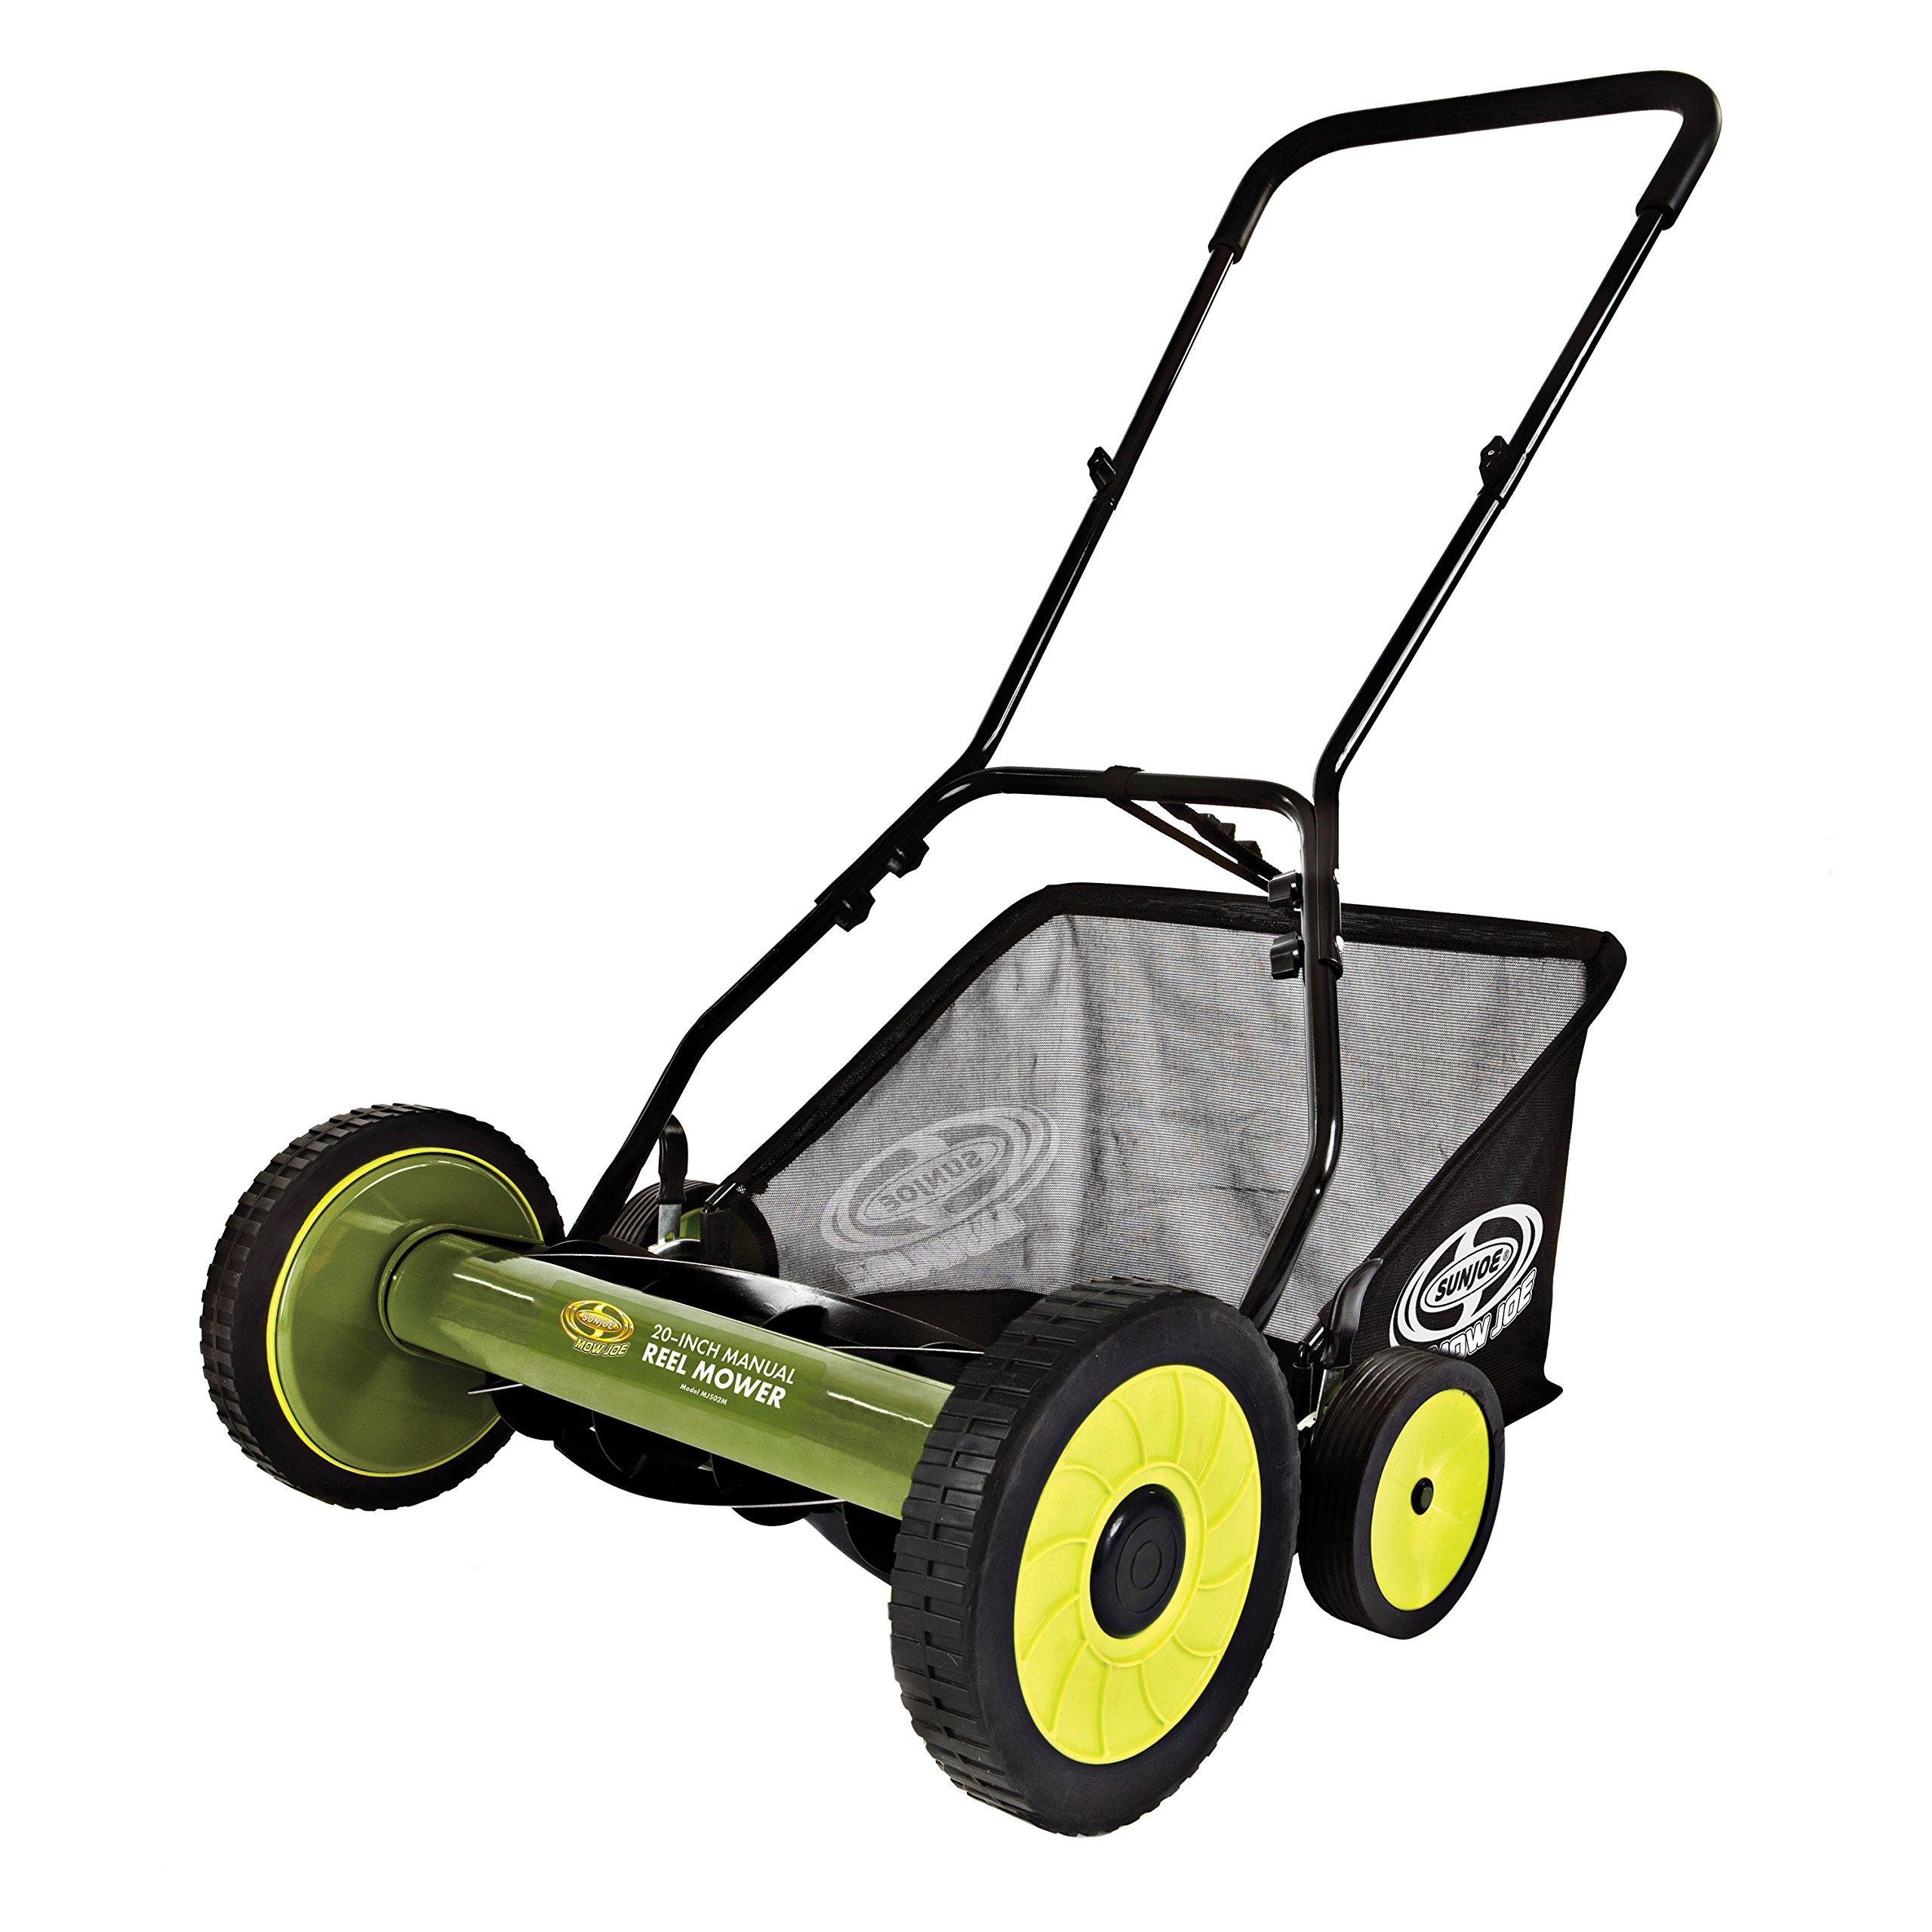 Snow Joe FBA_MJ502M 20-Inch Manual Reel Mower w/Grass Catcher, Green by Snow Joe